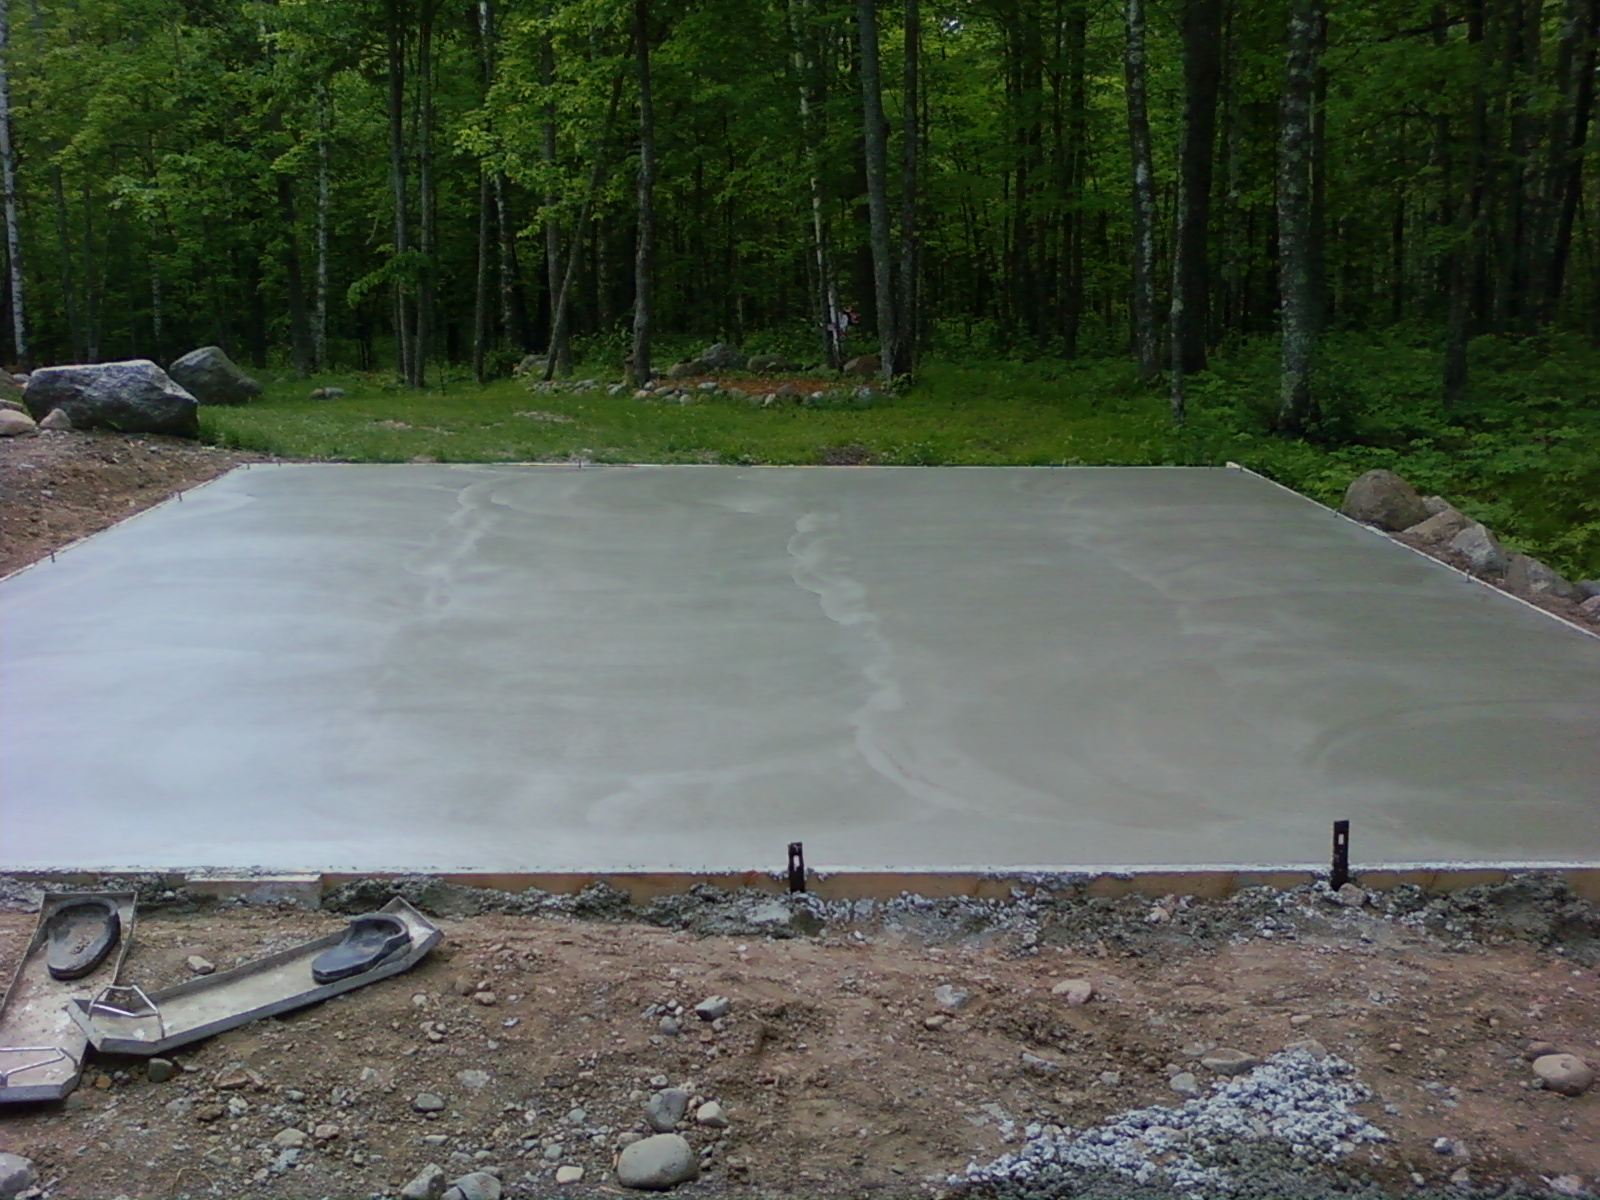 Tuthill masonry 22 39 x 24 39 garage slab for Garage slabs